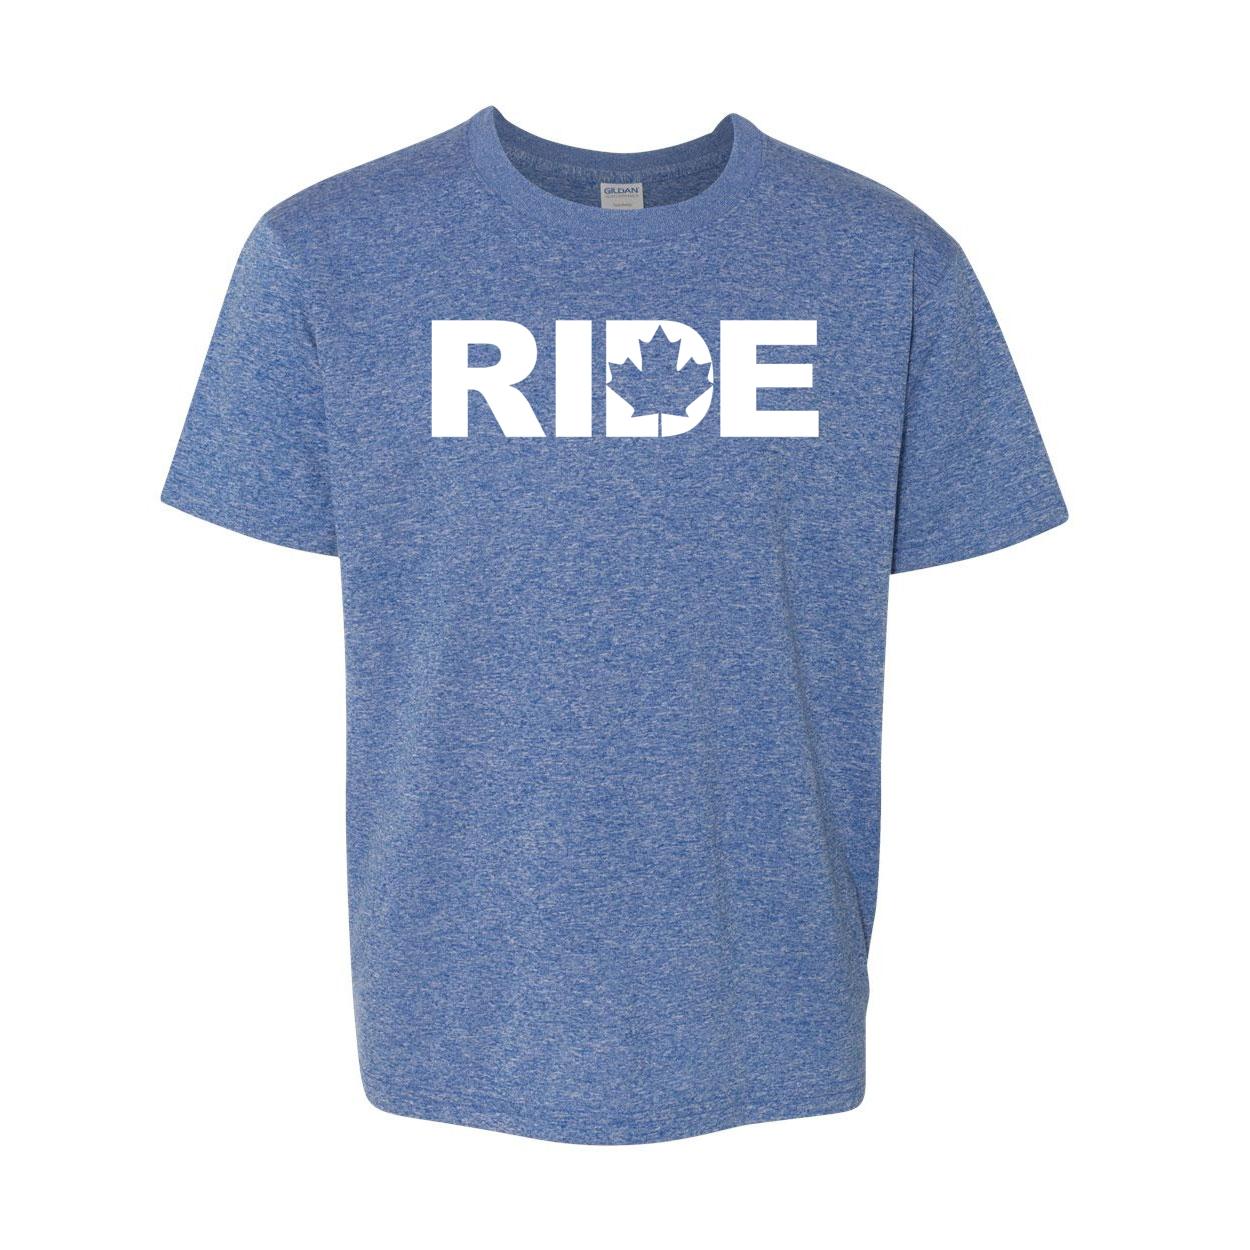 Ride Canada Classic Youth T-Shirt Blue (White Logo)